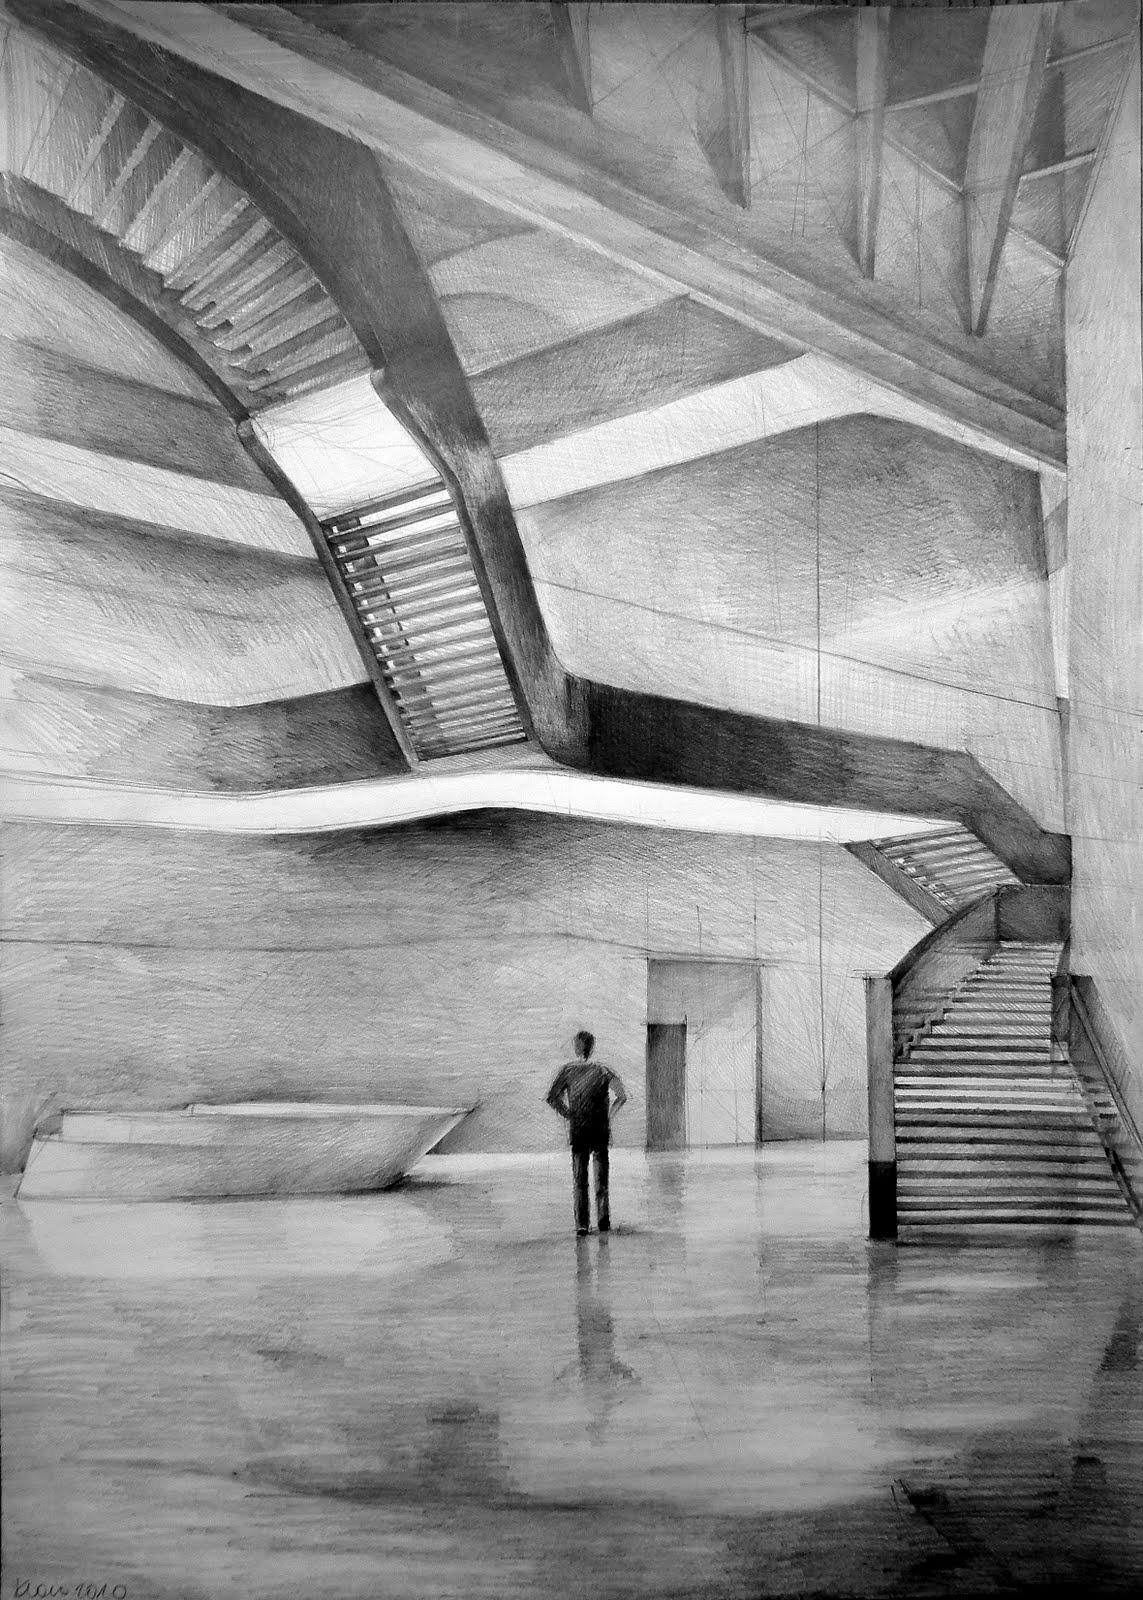 Zaha Hadid Floor Plans Architect Zaha Hadid Maxxi National Museum Of Xxi